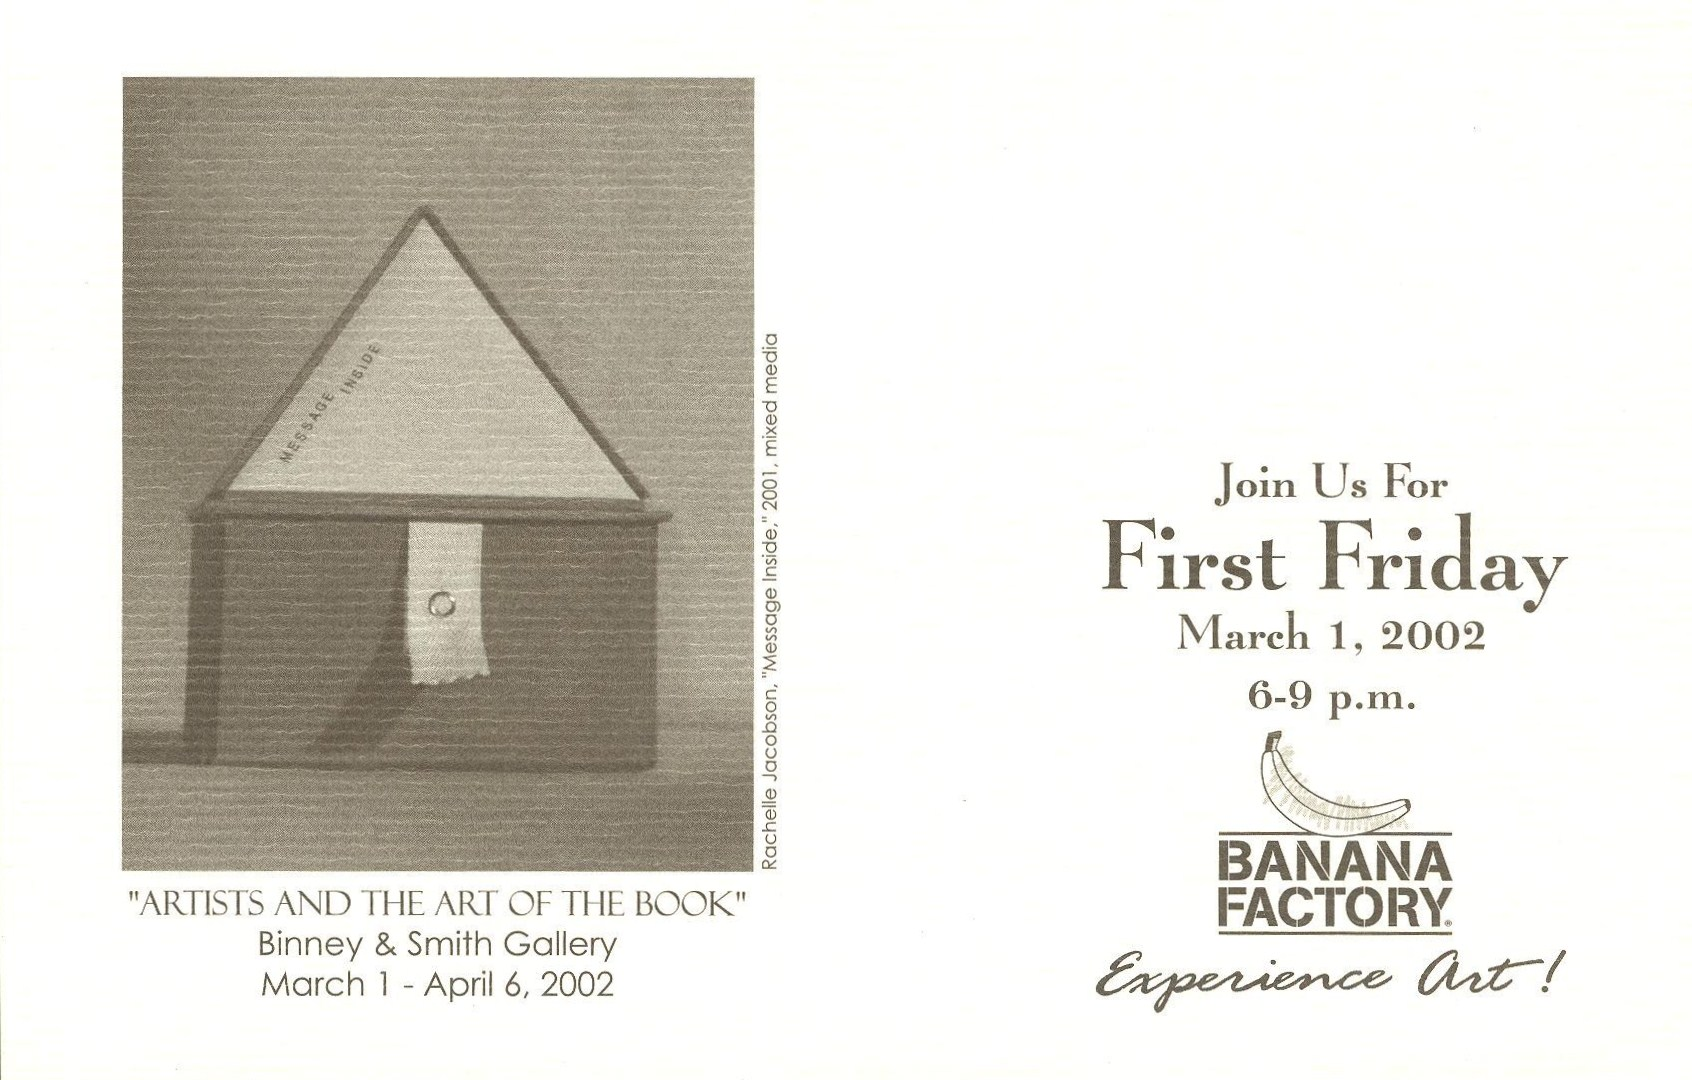 First Friday1 001.jpg